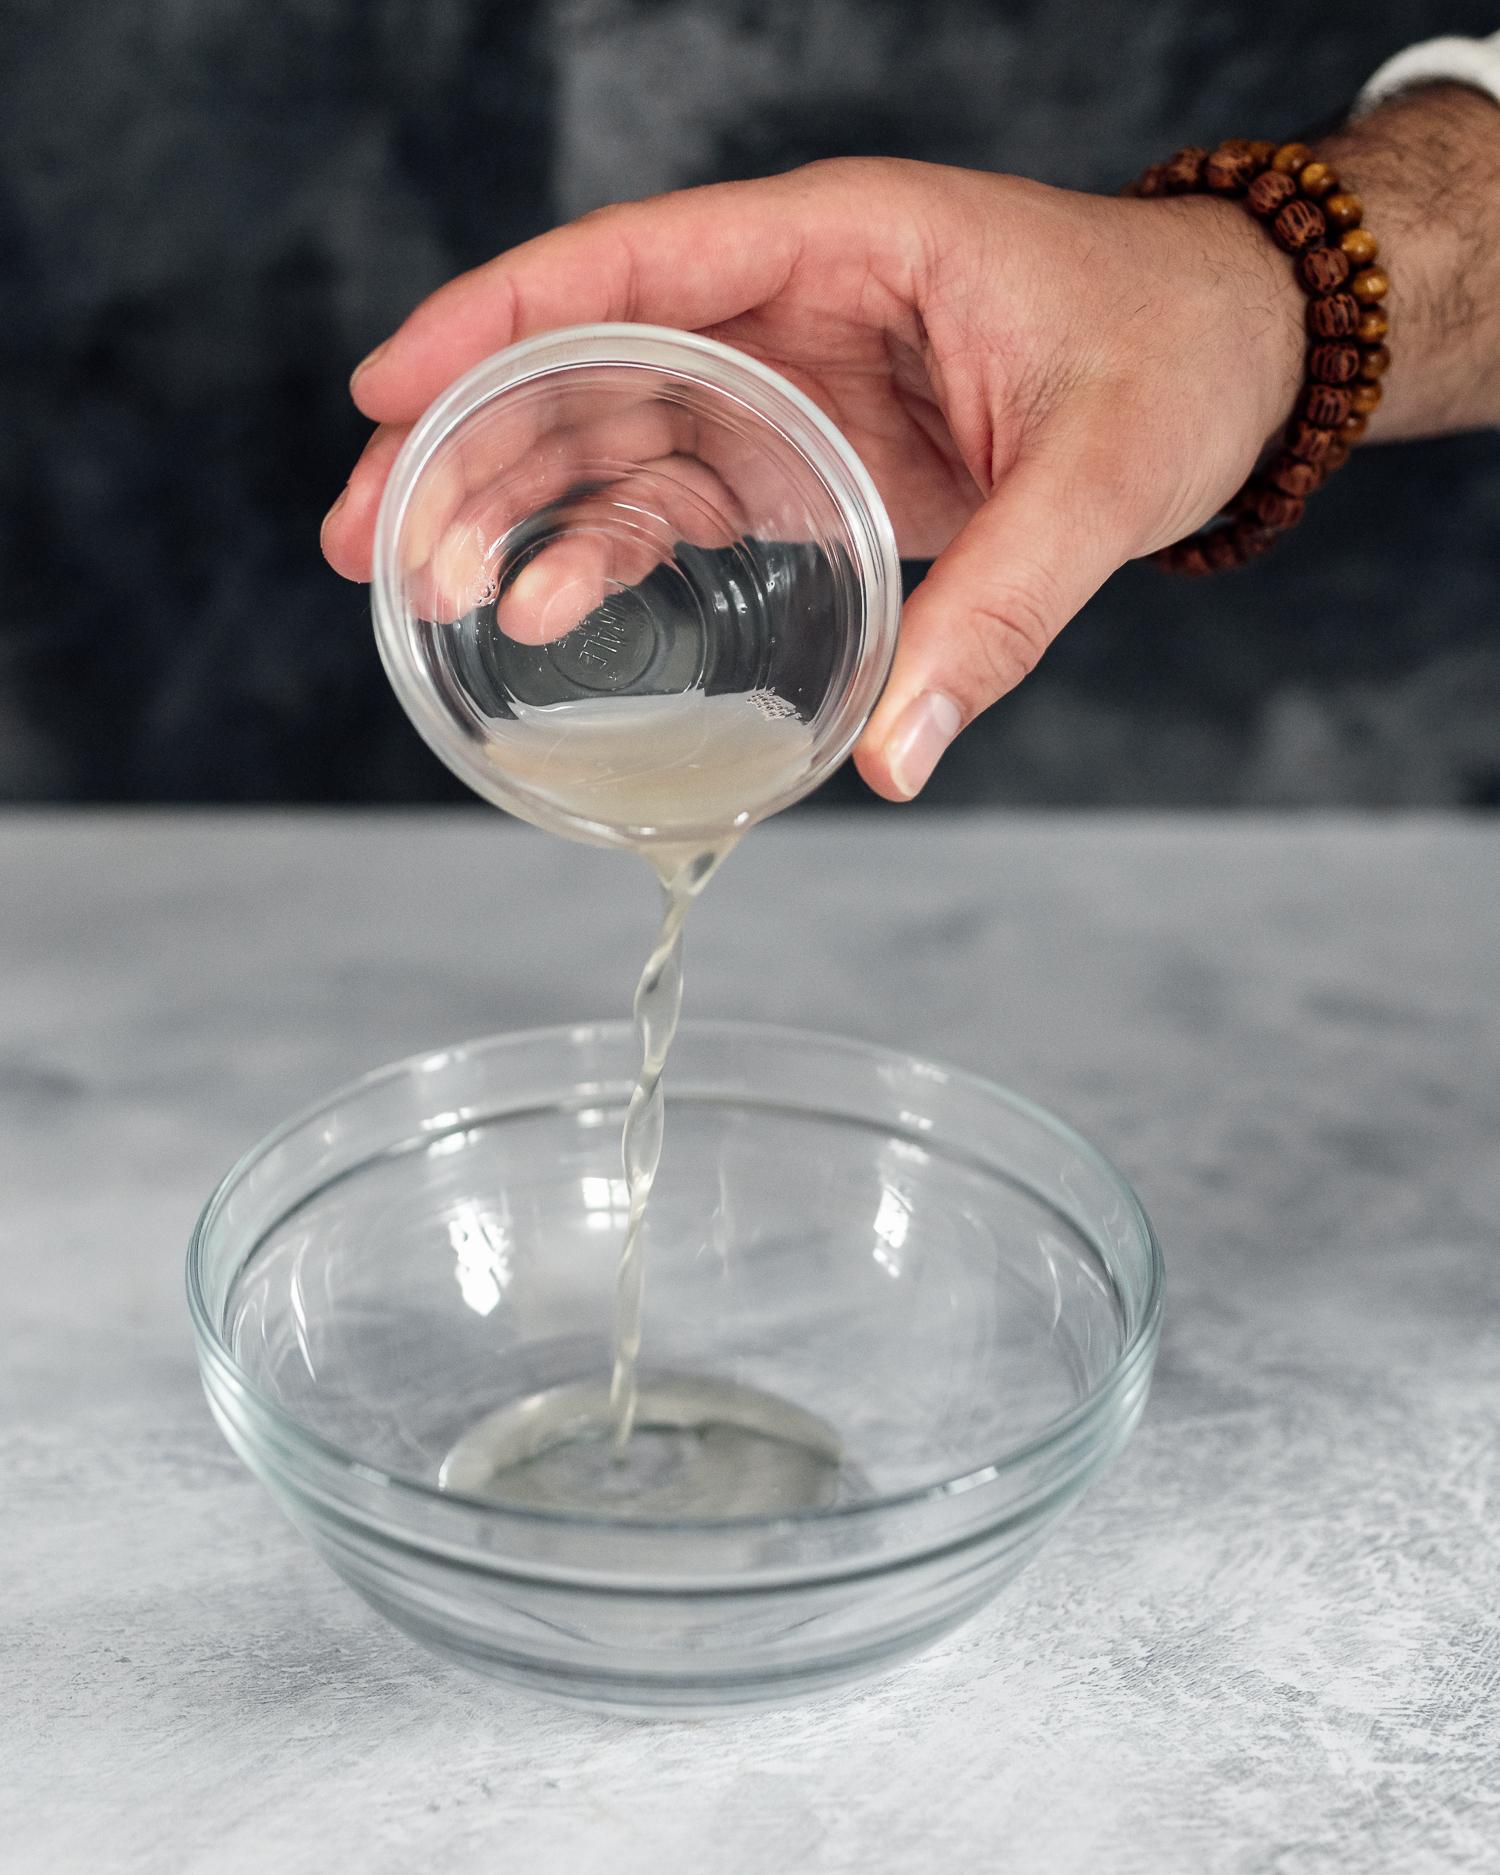 Hur man gör aquafaba